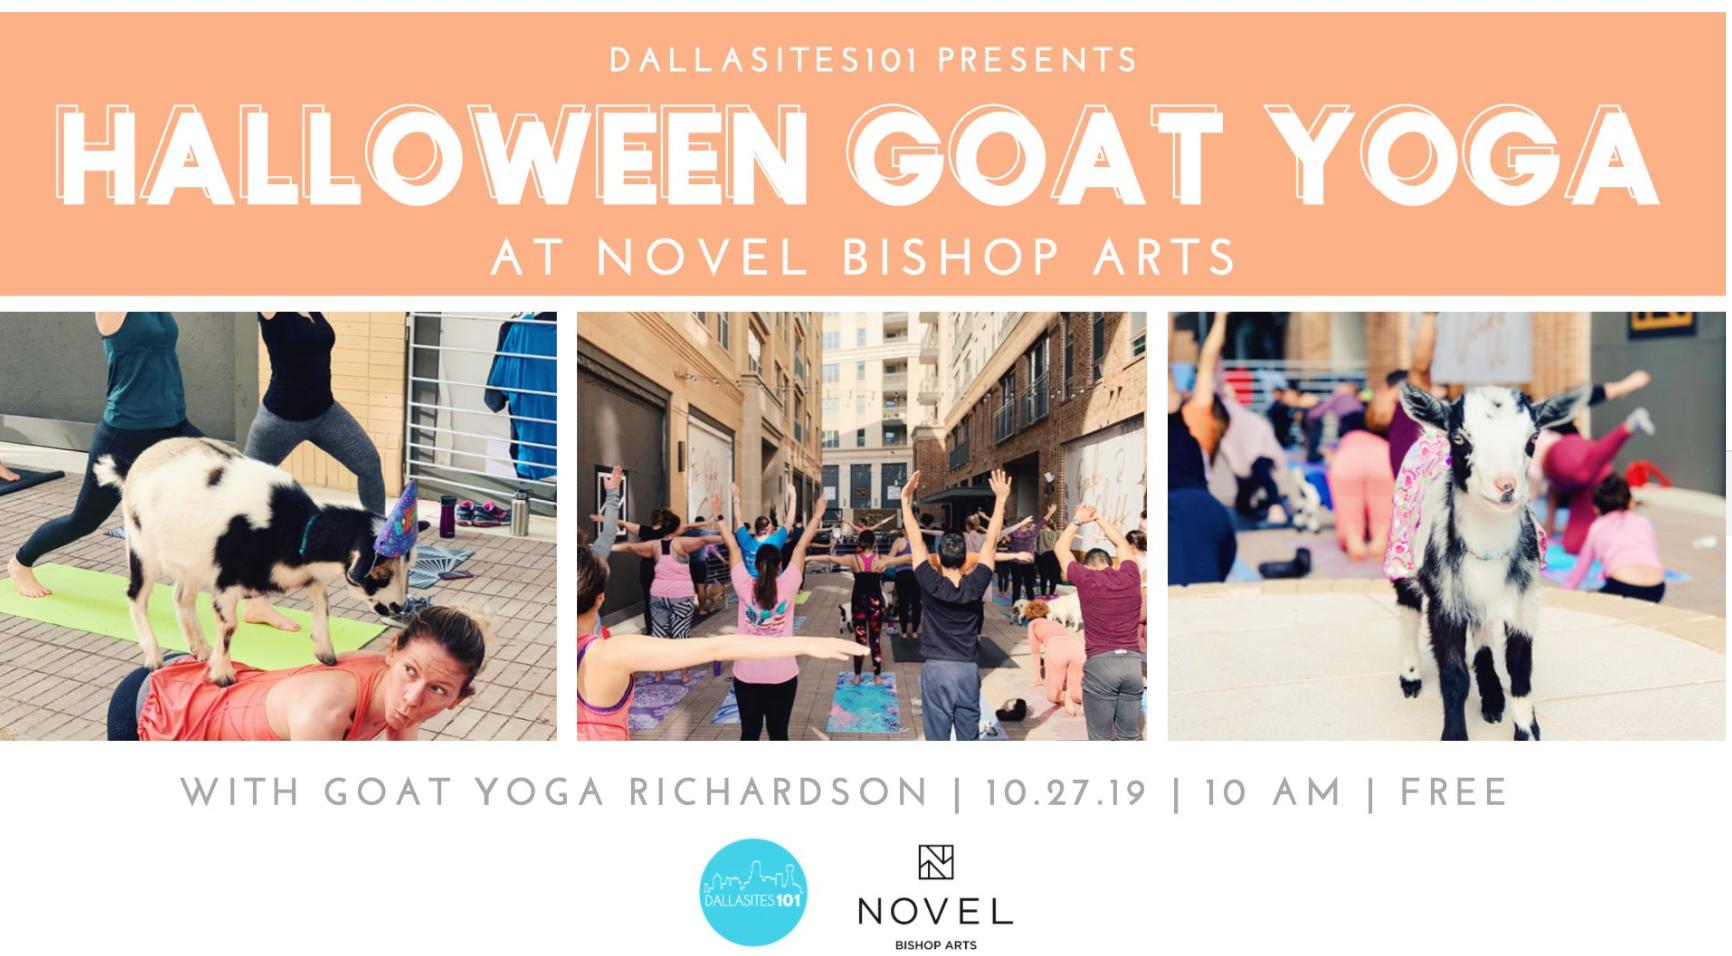 Halloween Goat Yoga Dallasites101